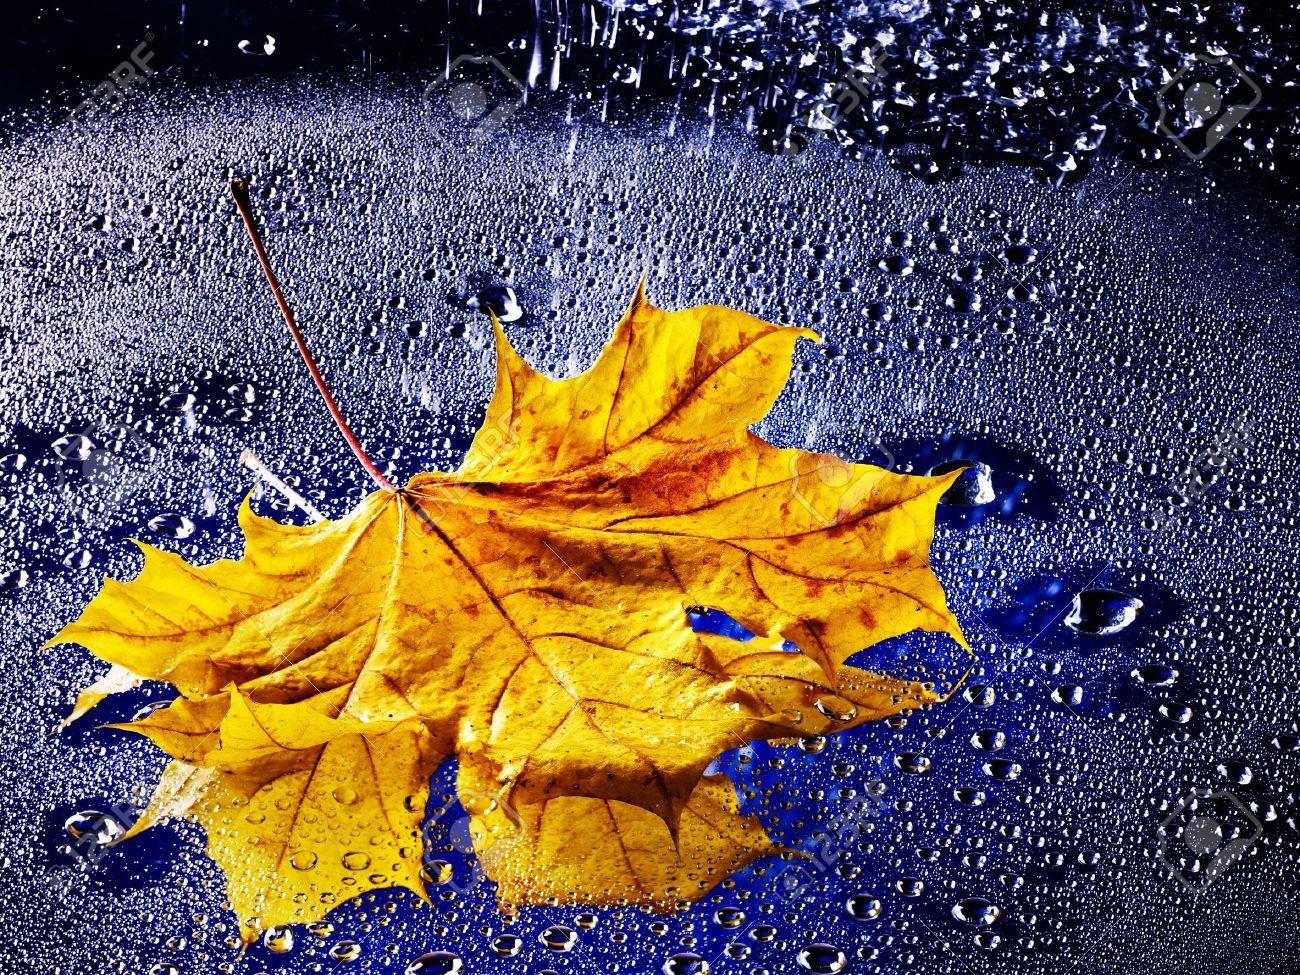 Wallpaper Leaf Drops Rain Autumn Water HD Picture Image